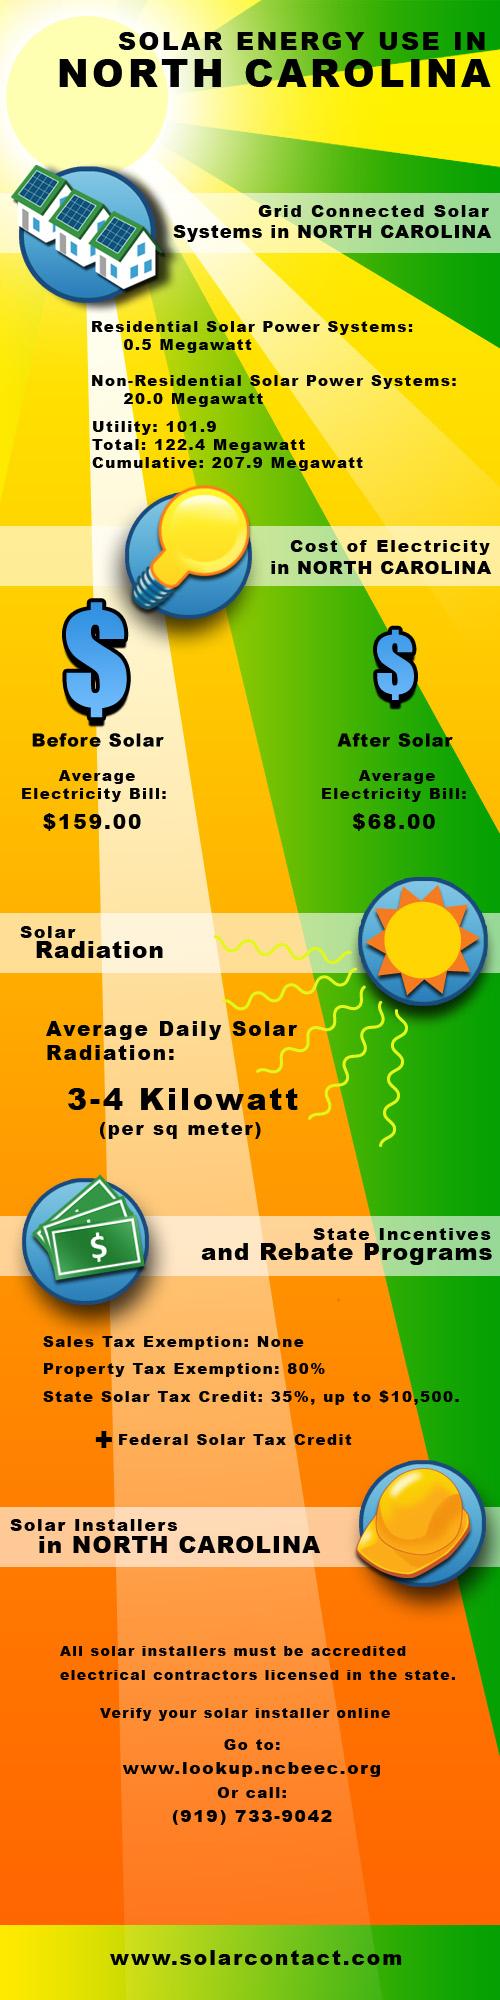 Fact Sheet Solar Energy Use in North Carolina